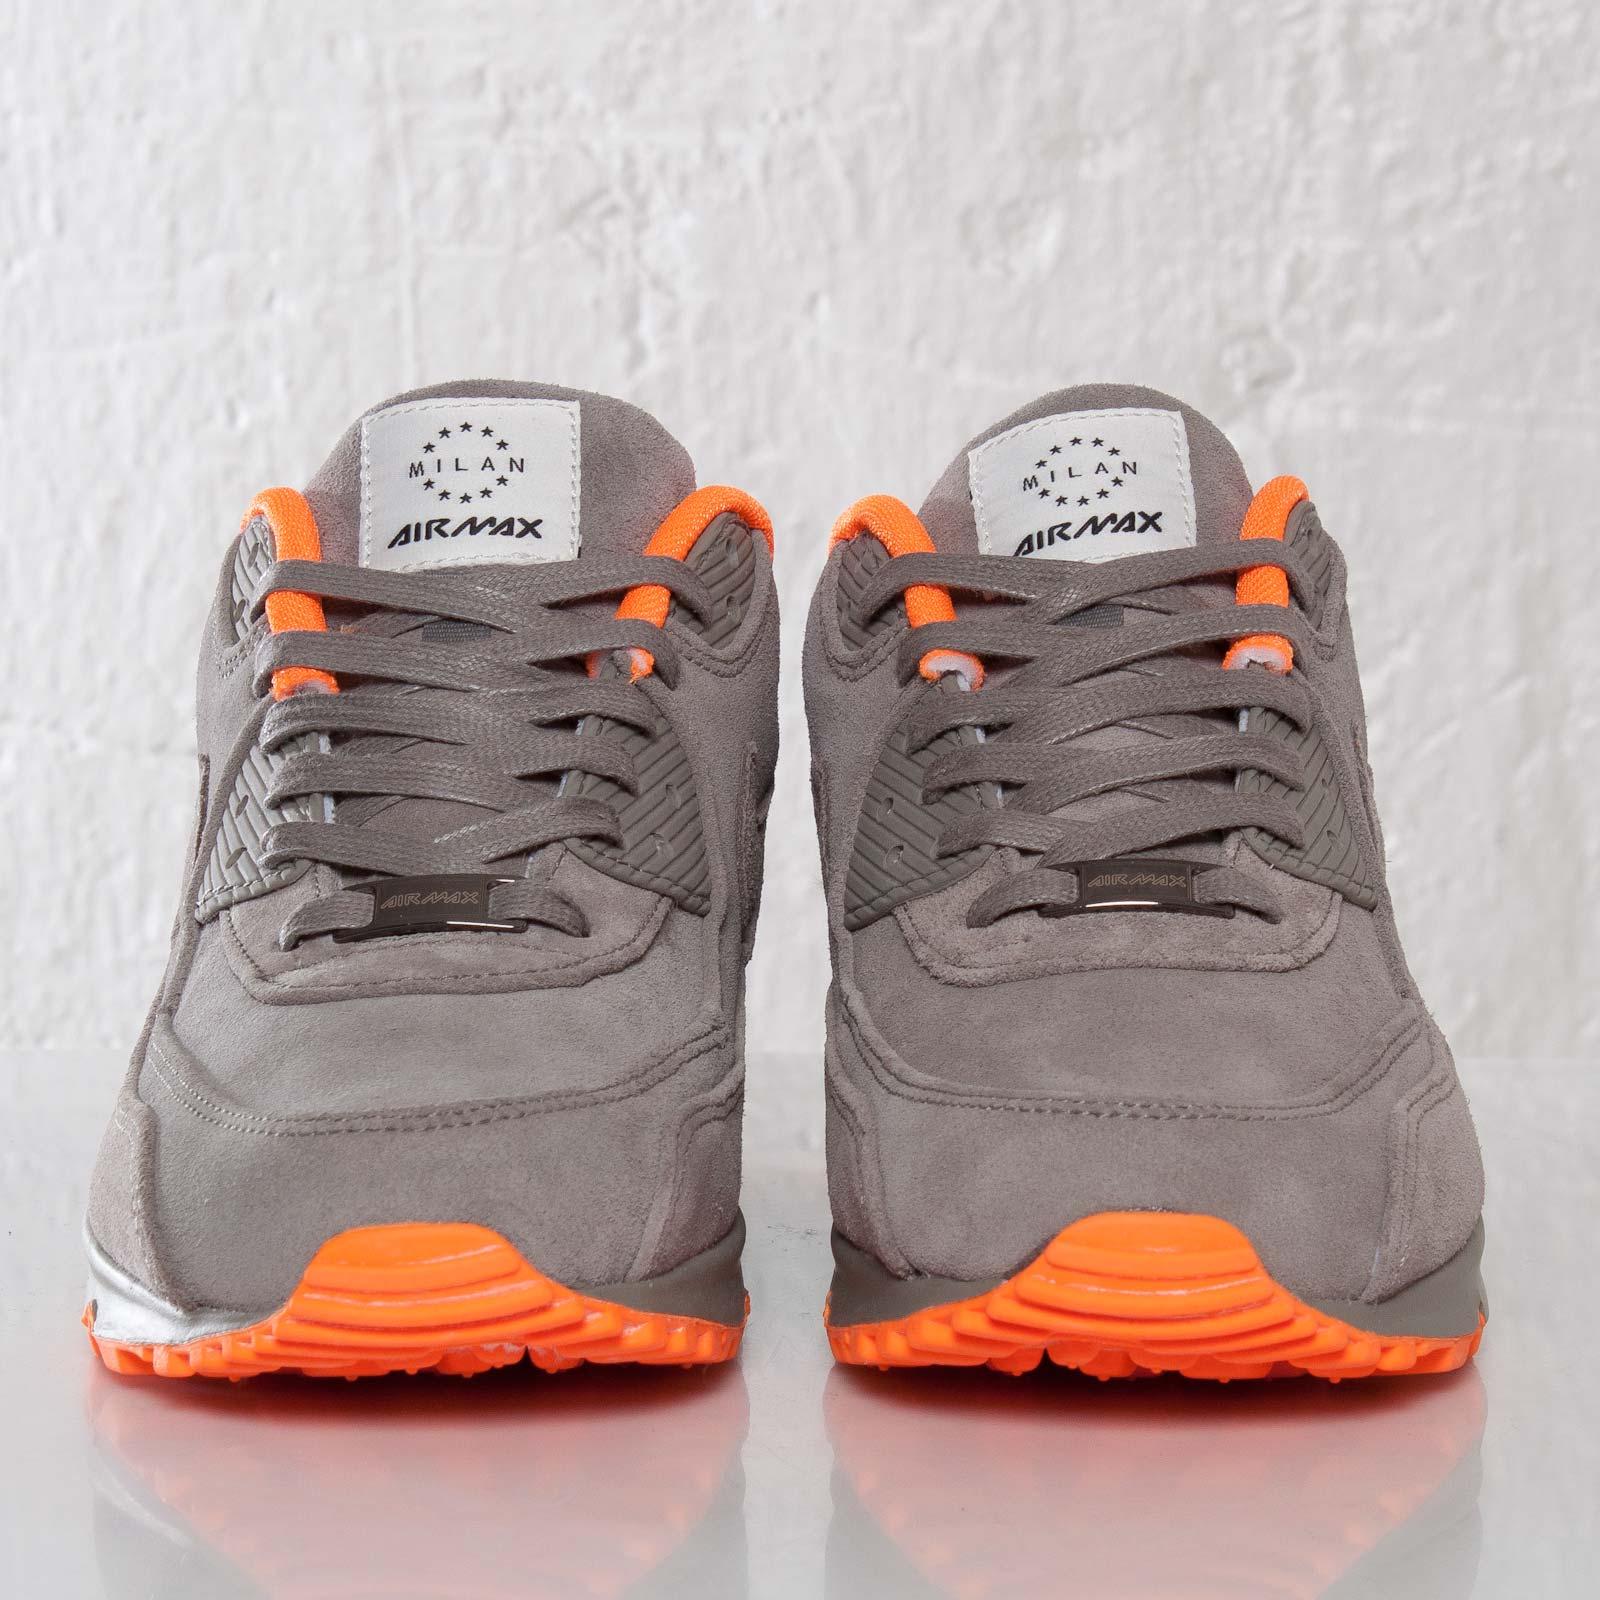 586848 221 Sneakersnstuff Qs Milano Sneakers Max Air 90 Nike qwRXXP